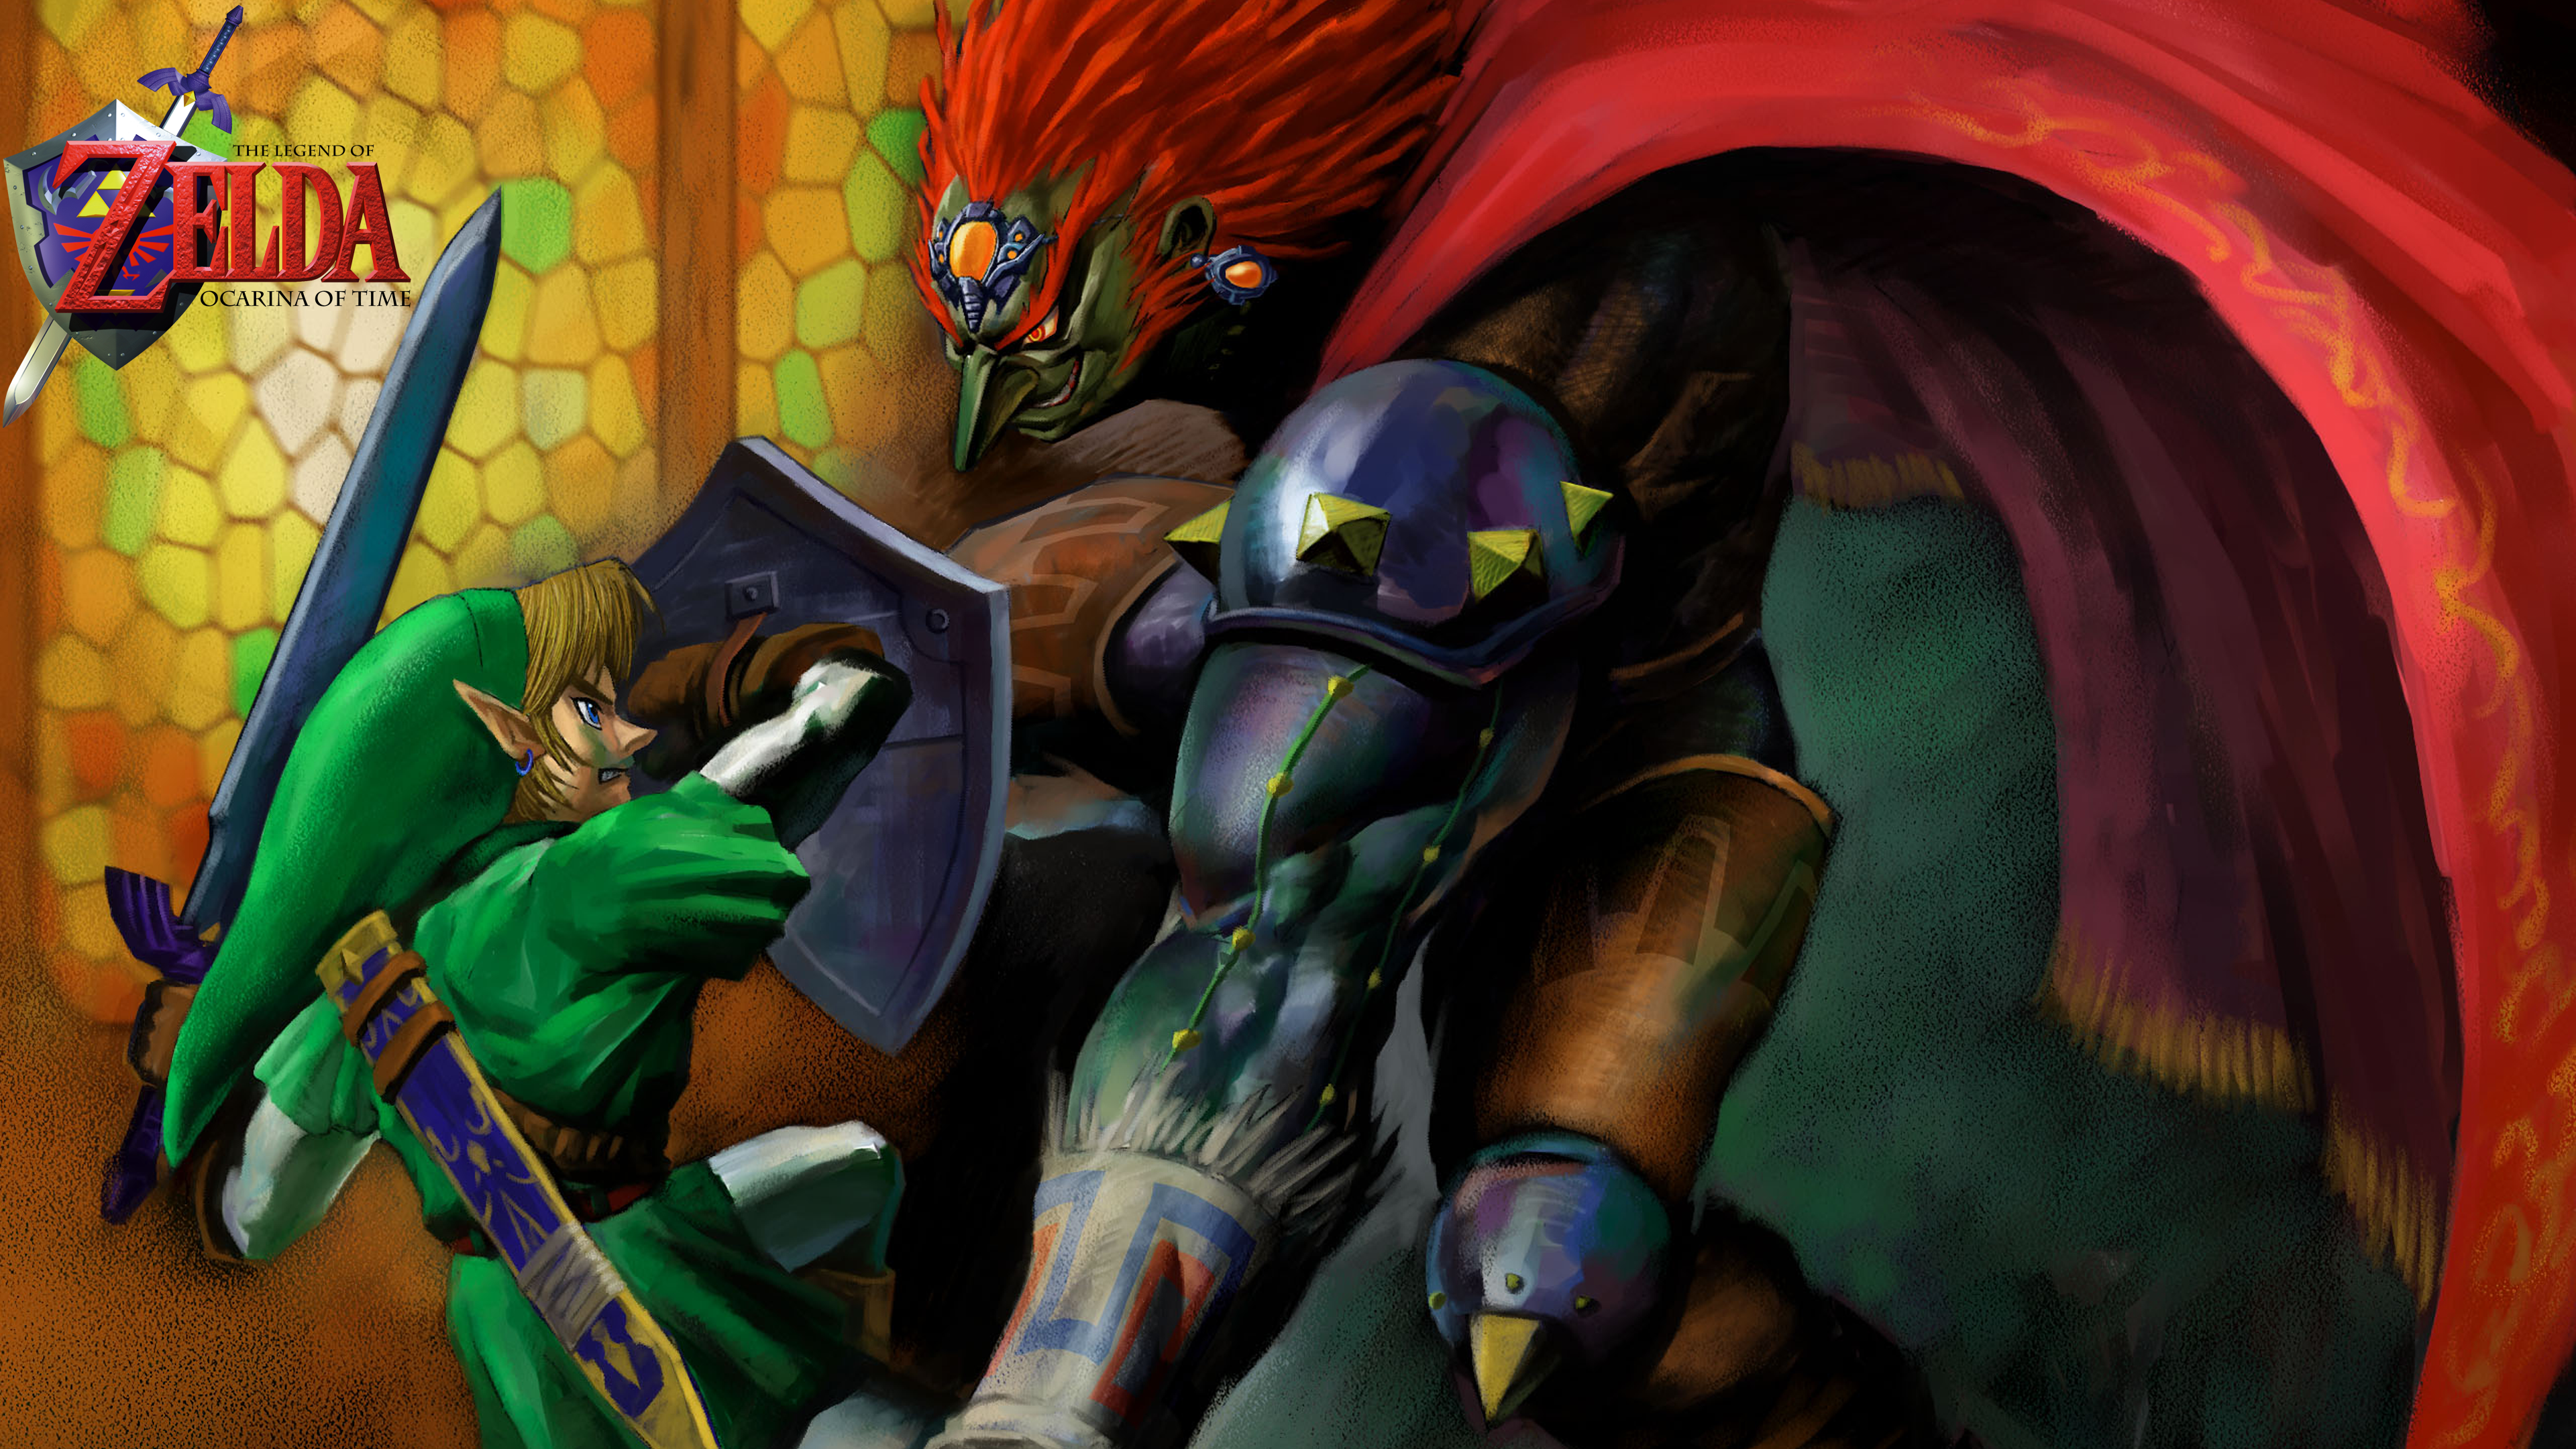 The Legend Of Zelda Ocarina Time Ganondorf Vs Link 4K Wallpaper